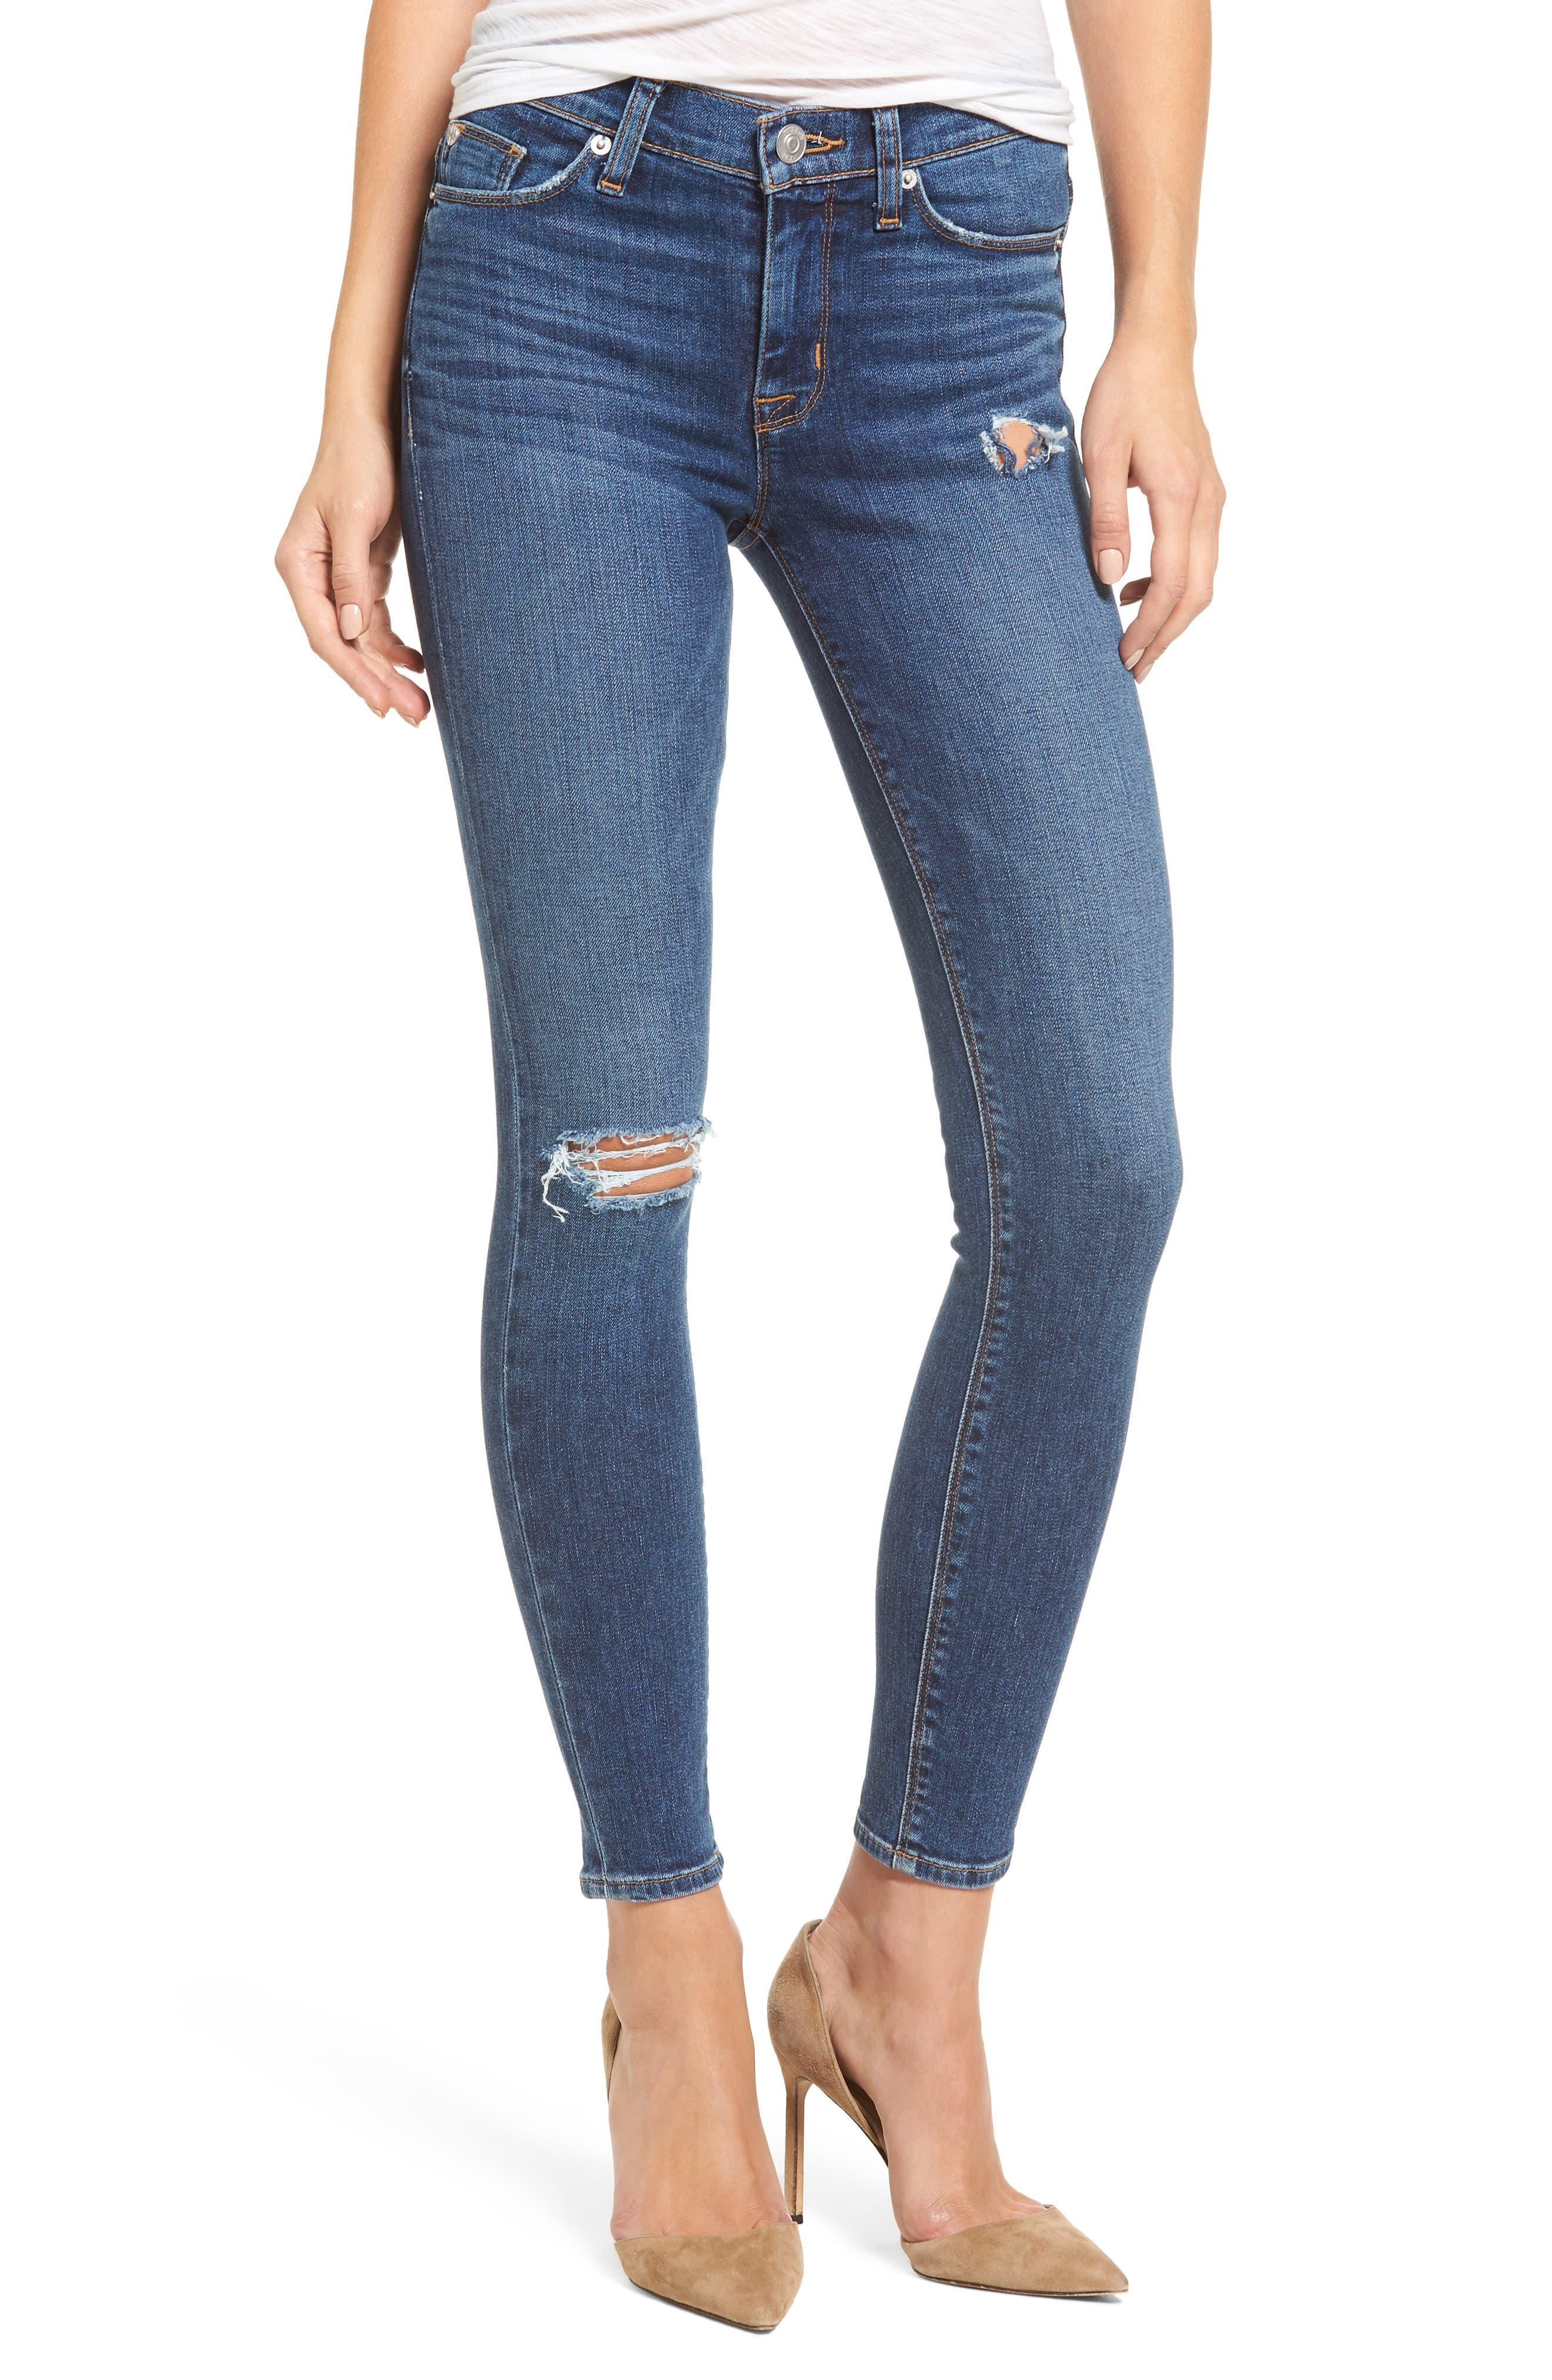 Main Image - Hudson Jeans Nico Ankle Super Skinny Jeans (Jigsaw)